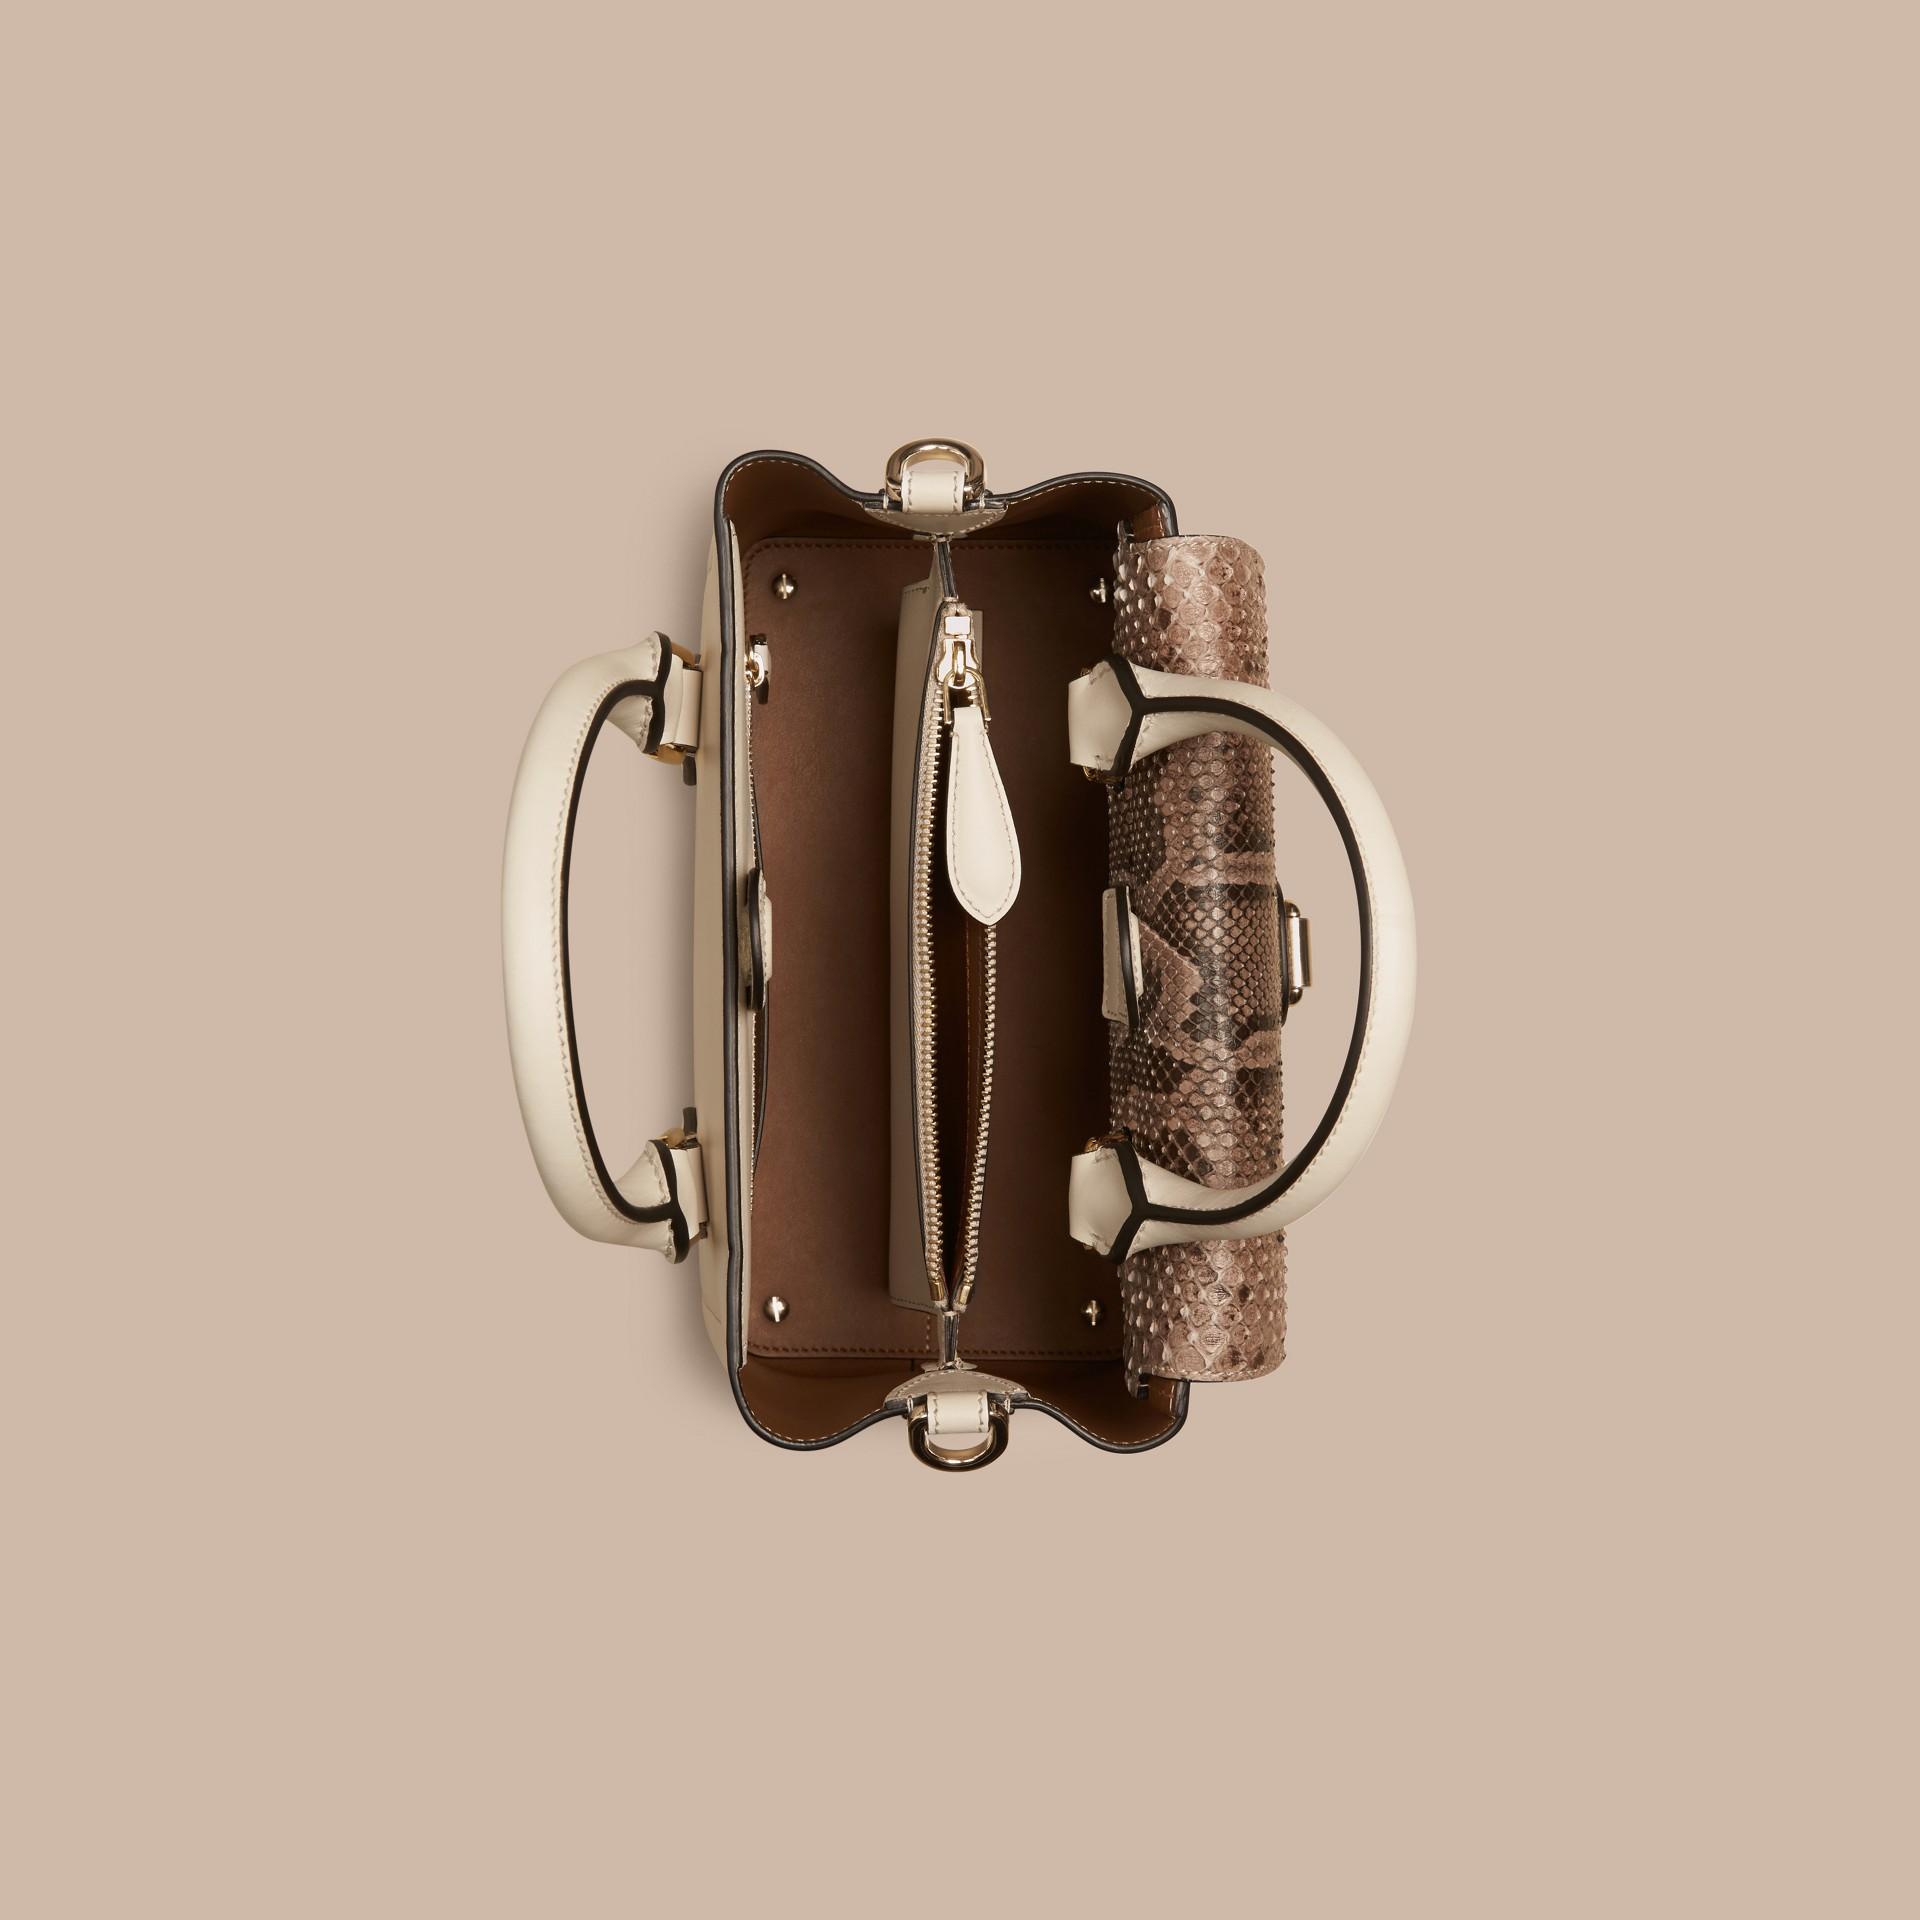 Steinfarben The Small Saddle Bag aus Glattleder und Pythonleder - Galerie-Bild 5